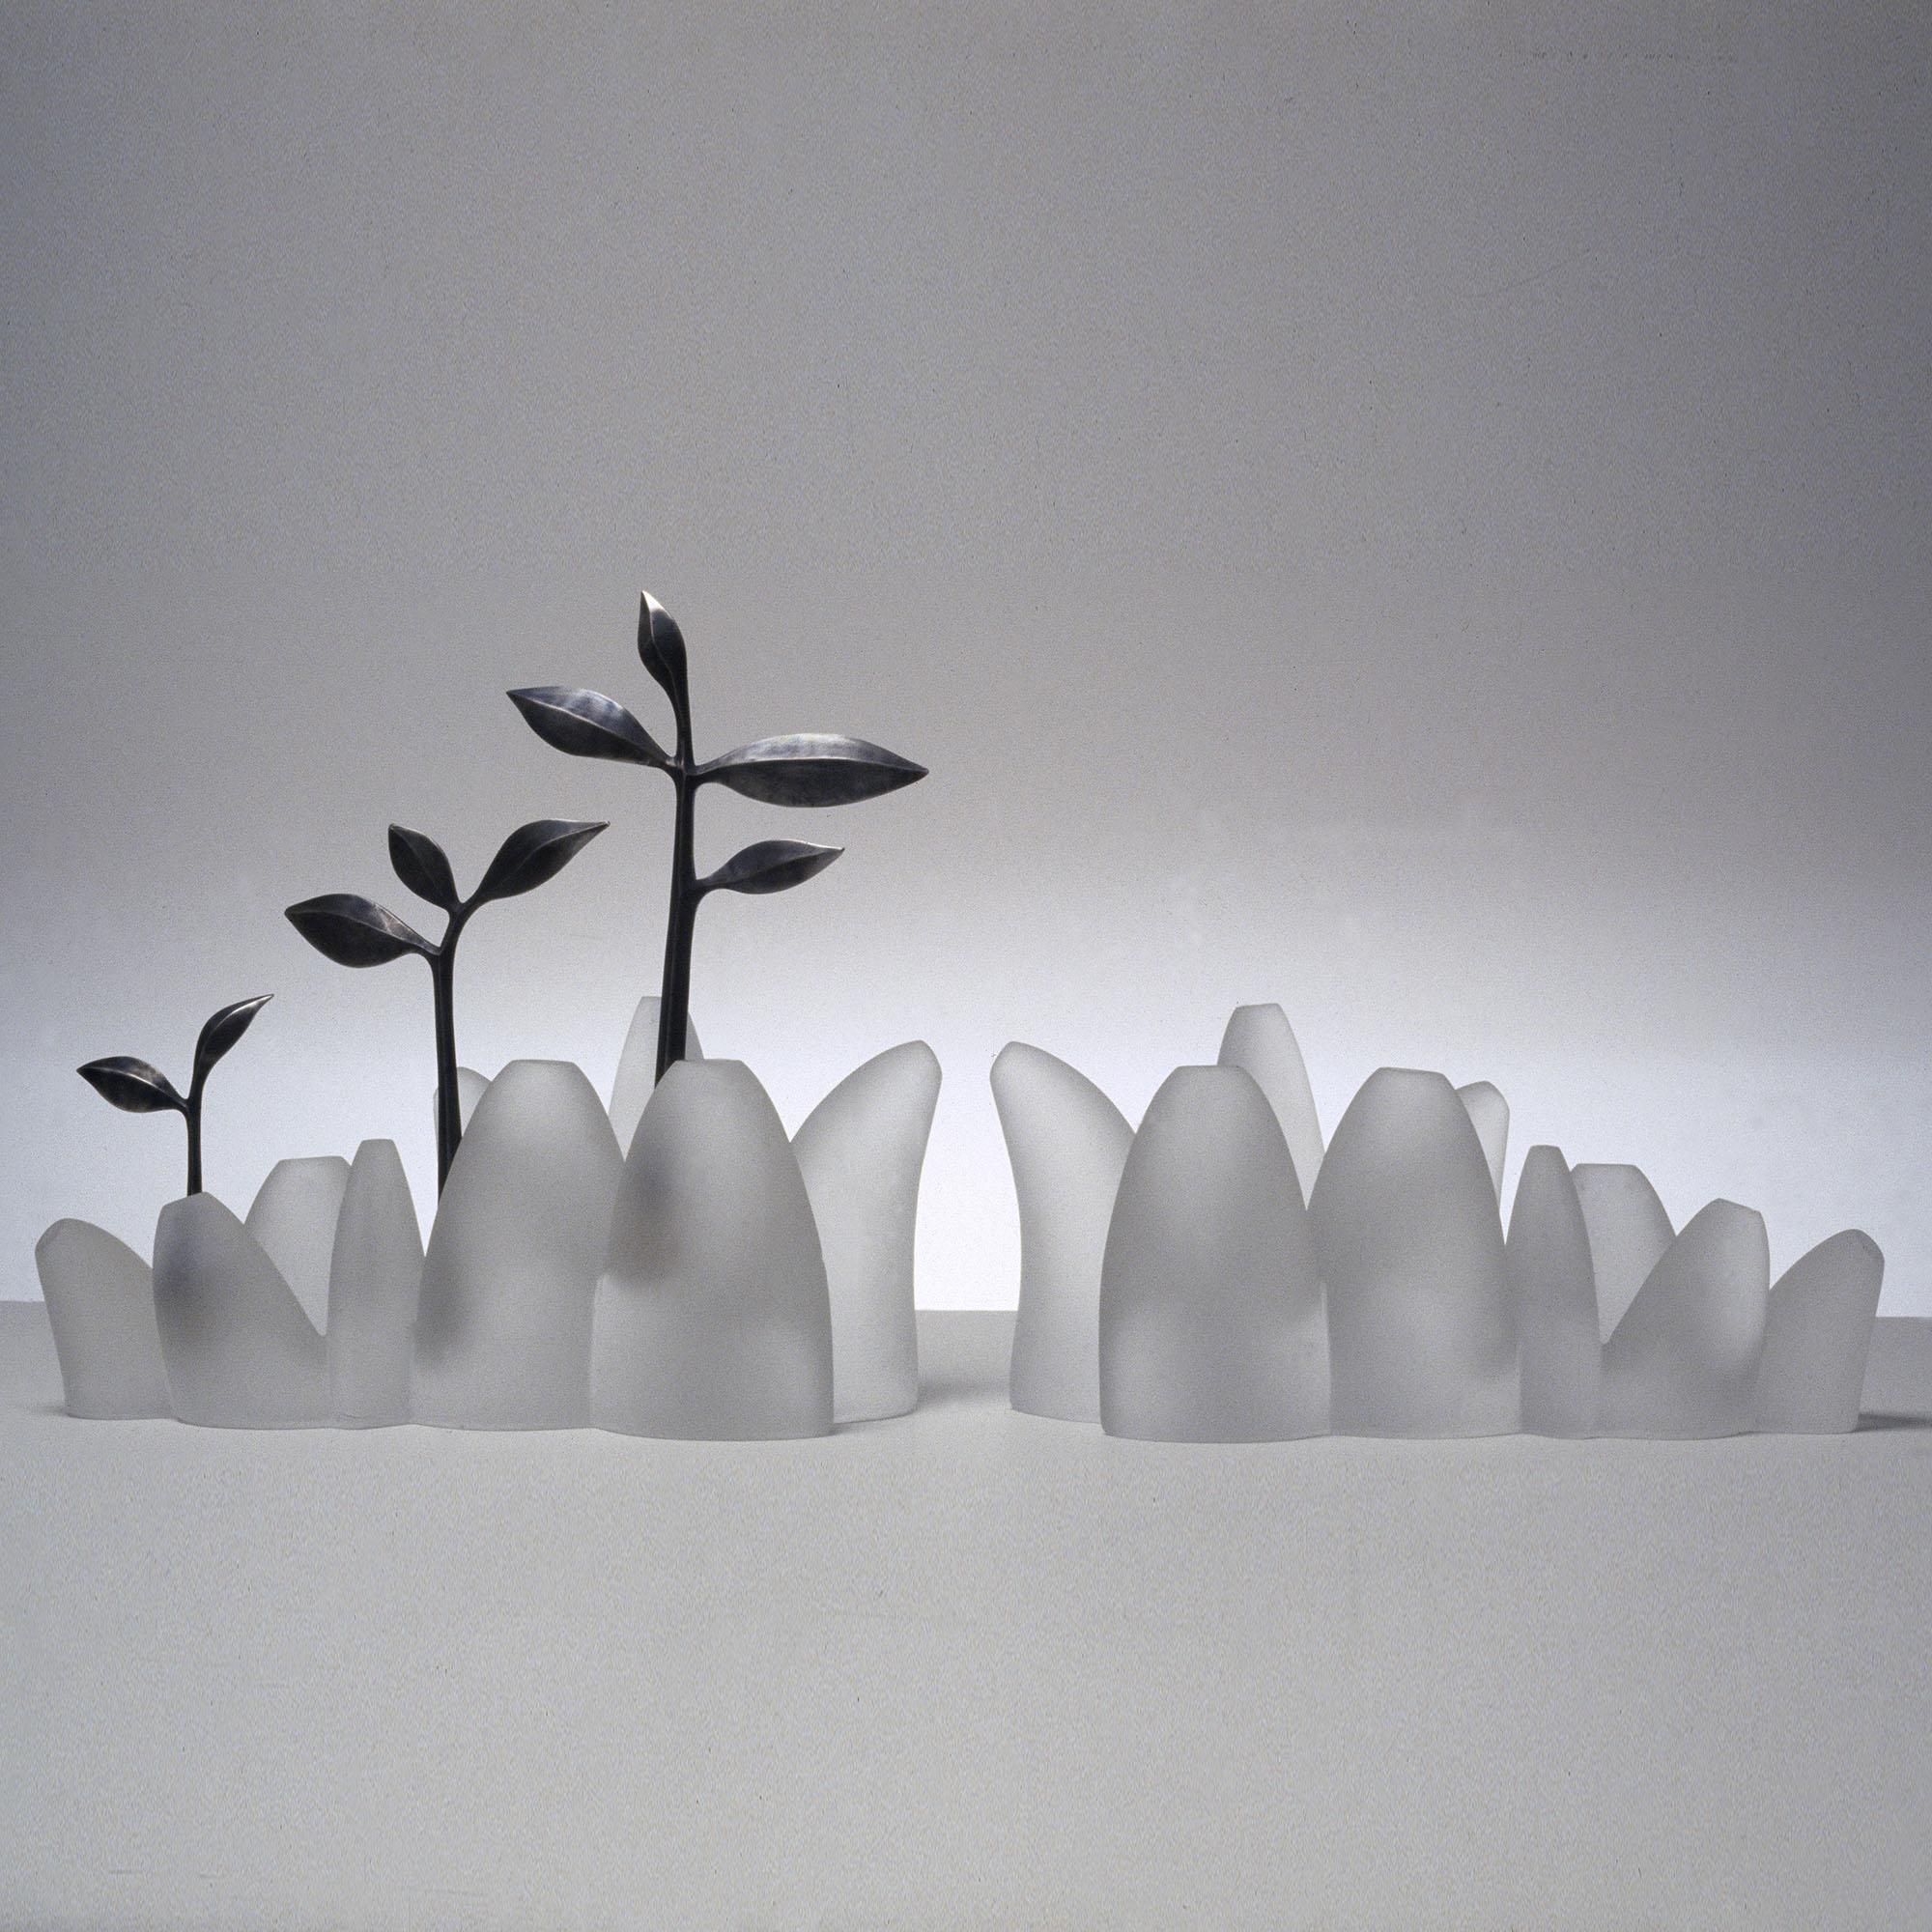 Growth | 2002 | Angela Jarman